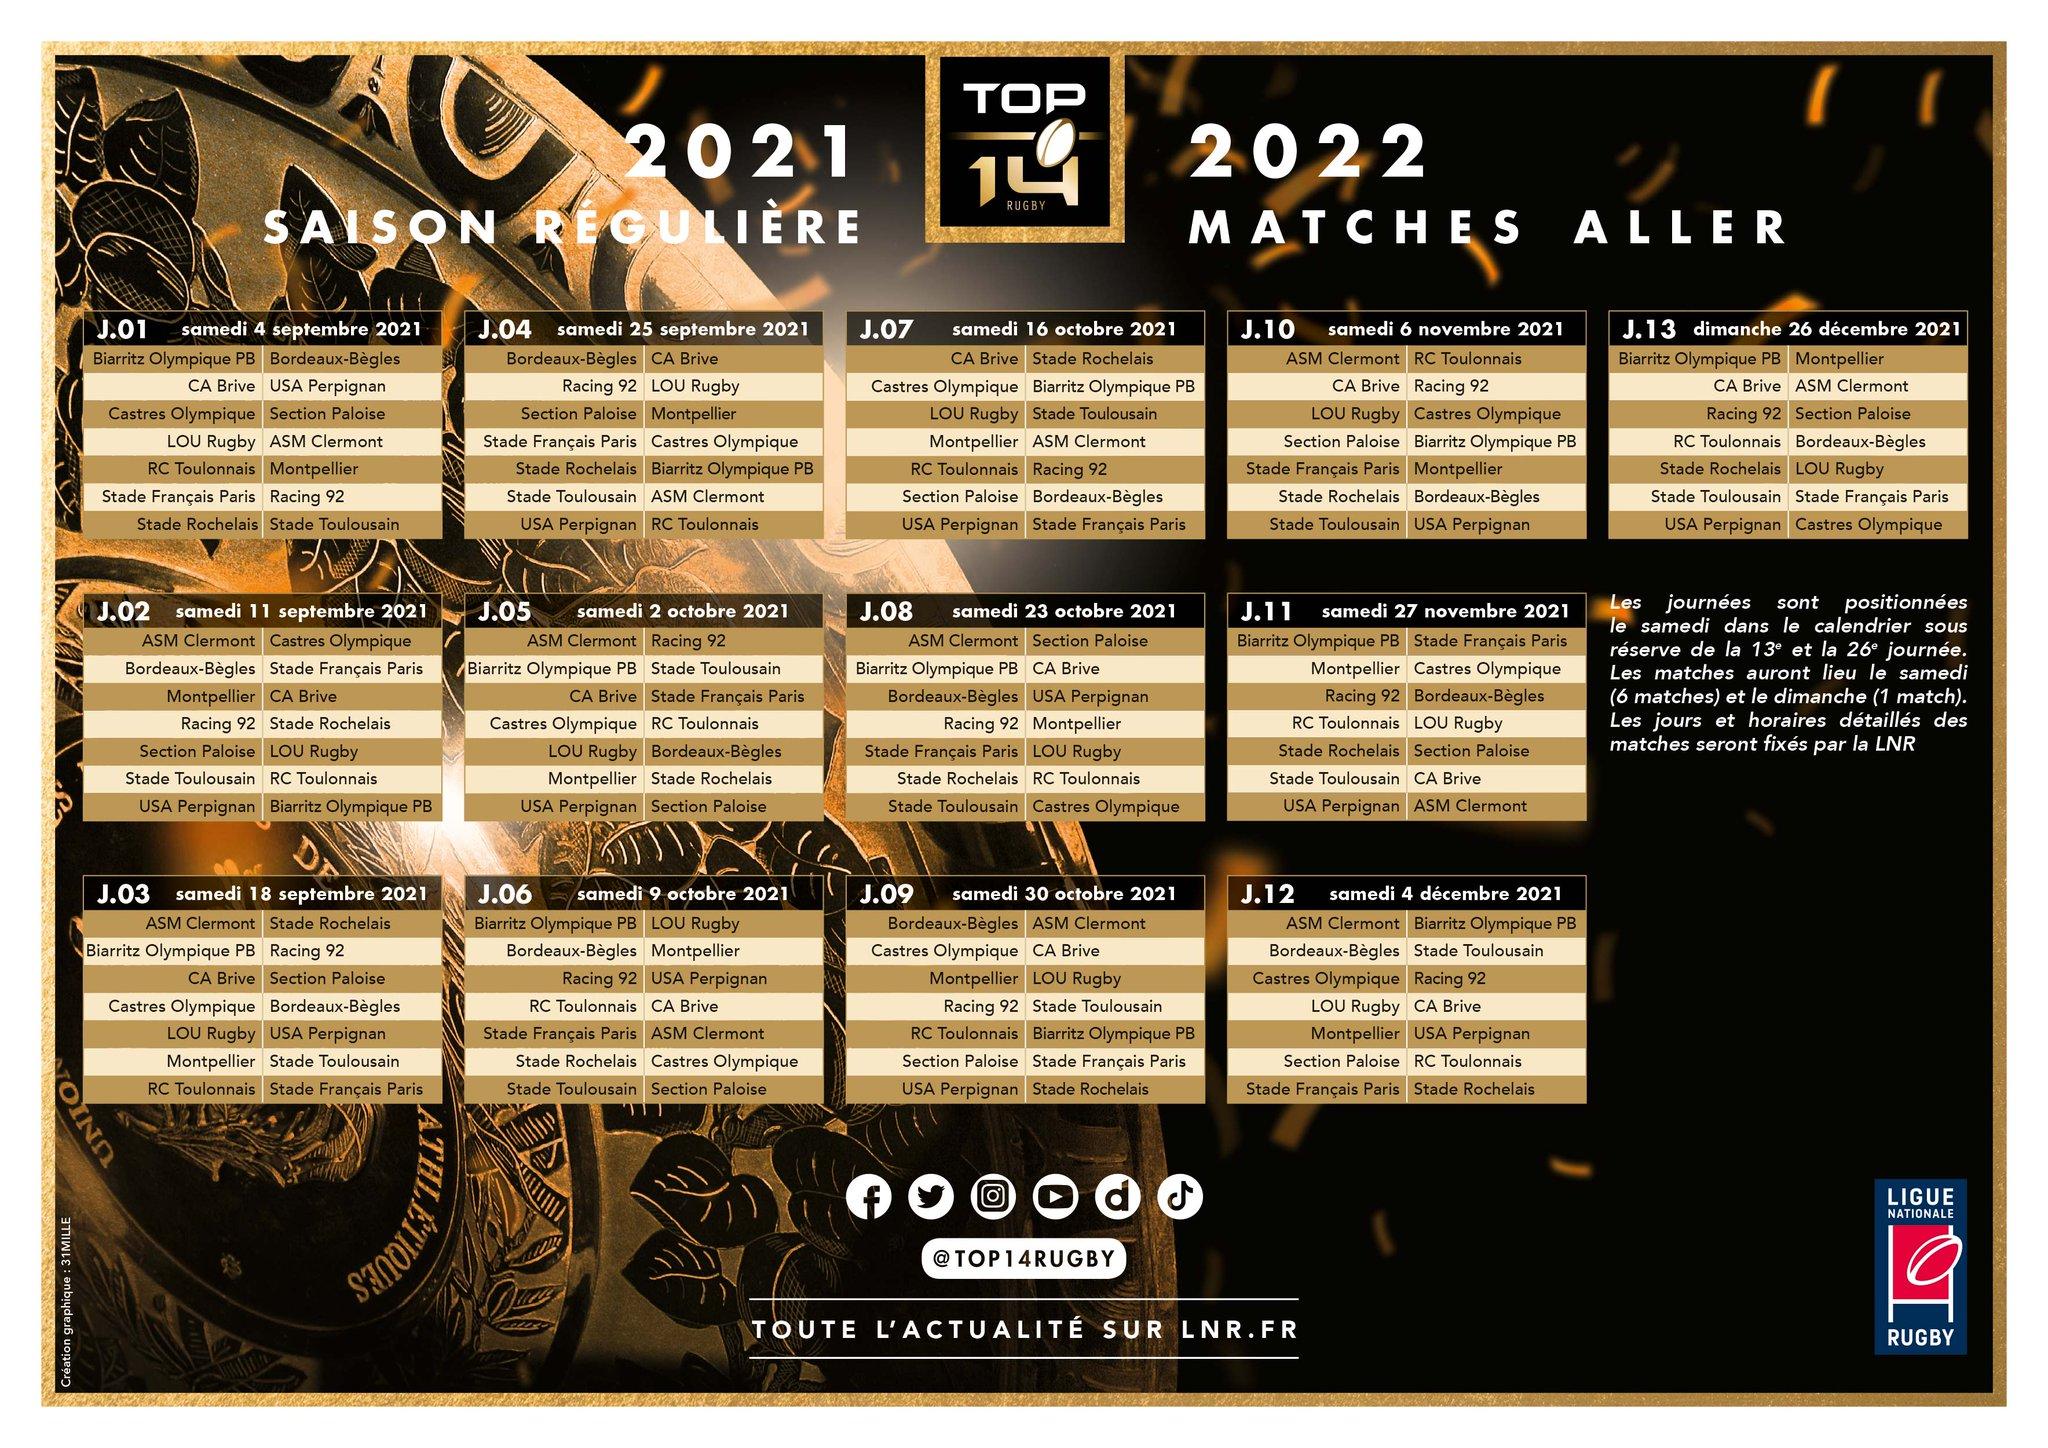 Calendrier 2022 Rugby OFFICIEL. Le calendrier des oppositions du Top 14 2021/2022